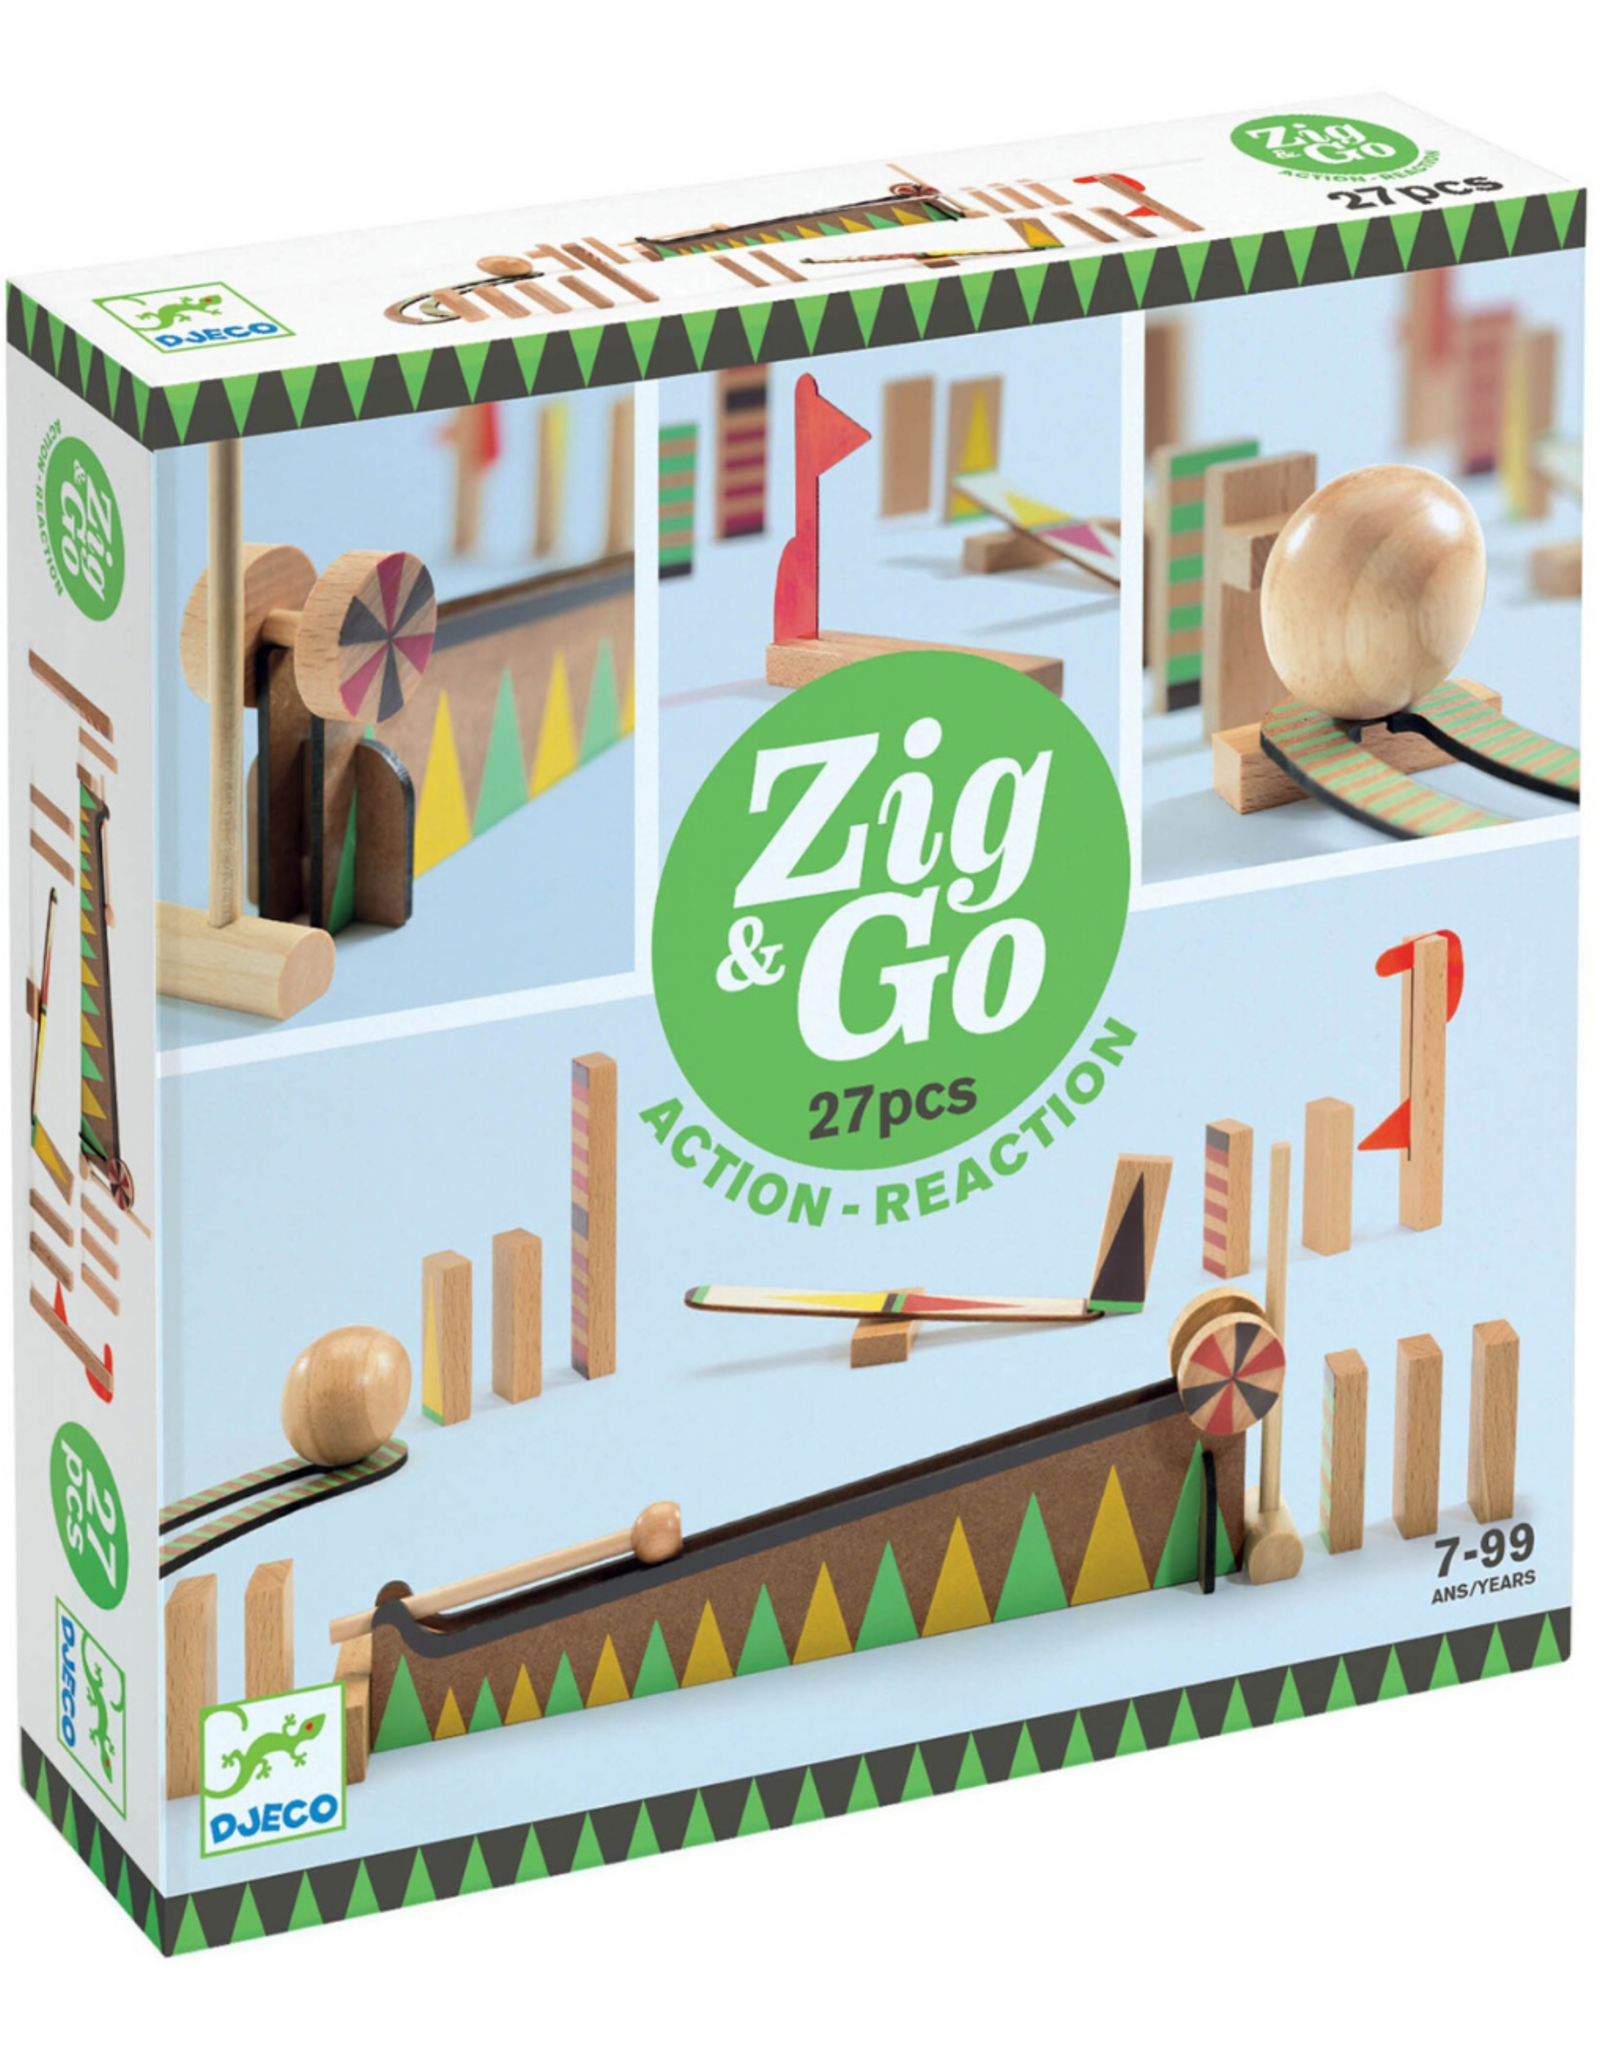 Djeco Jeu de réaction en chaîne Zig & Go